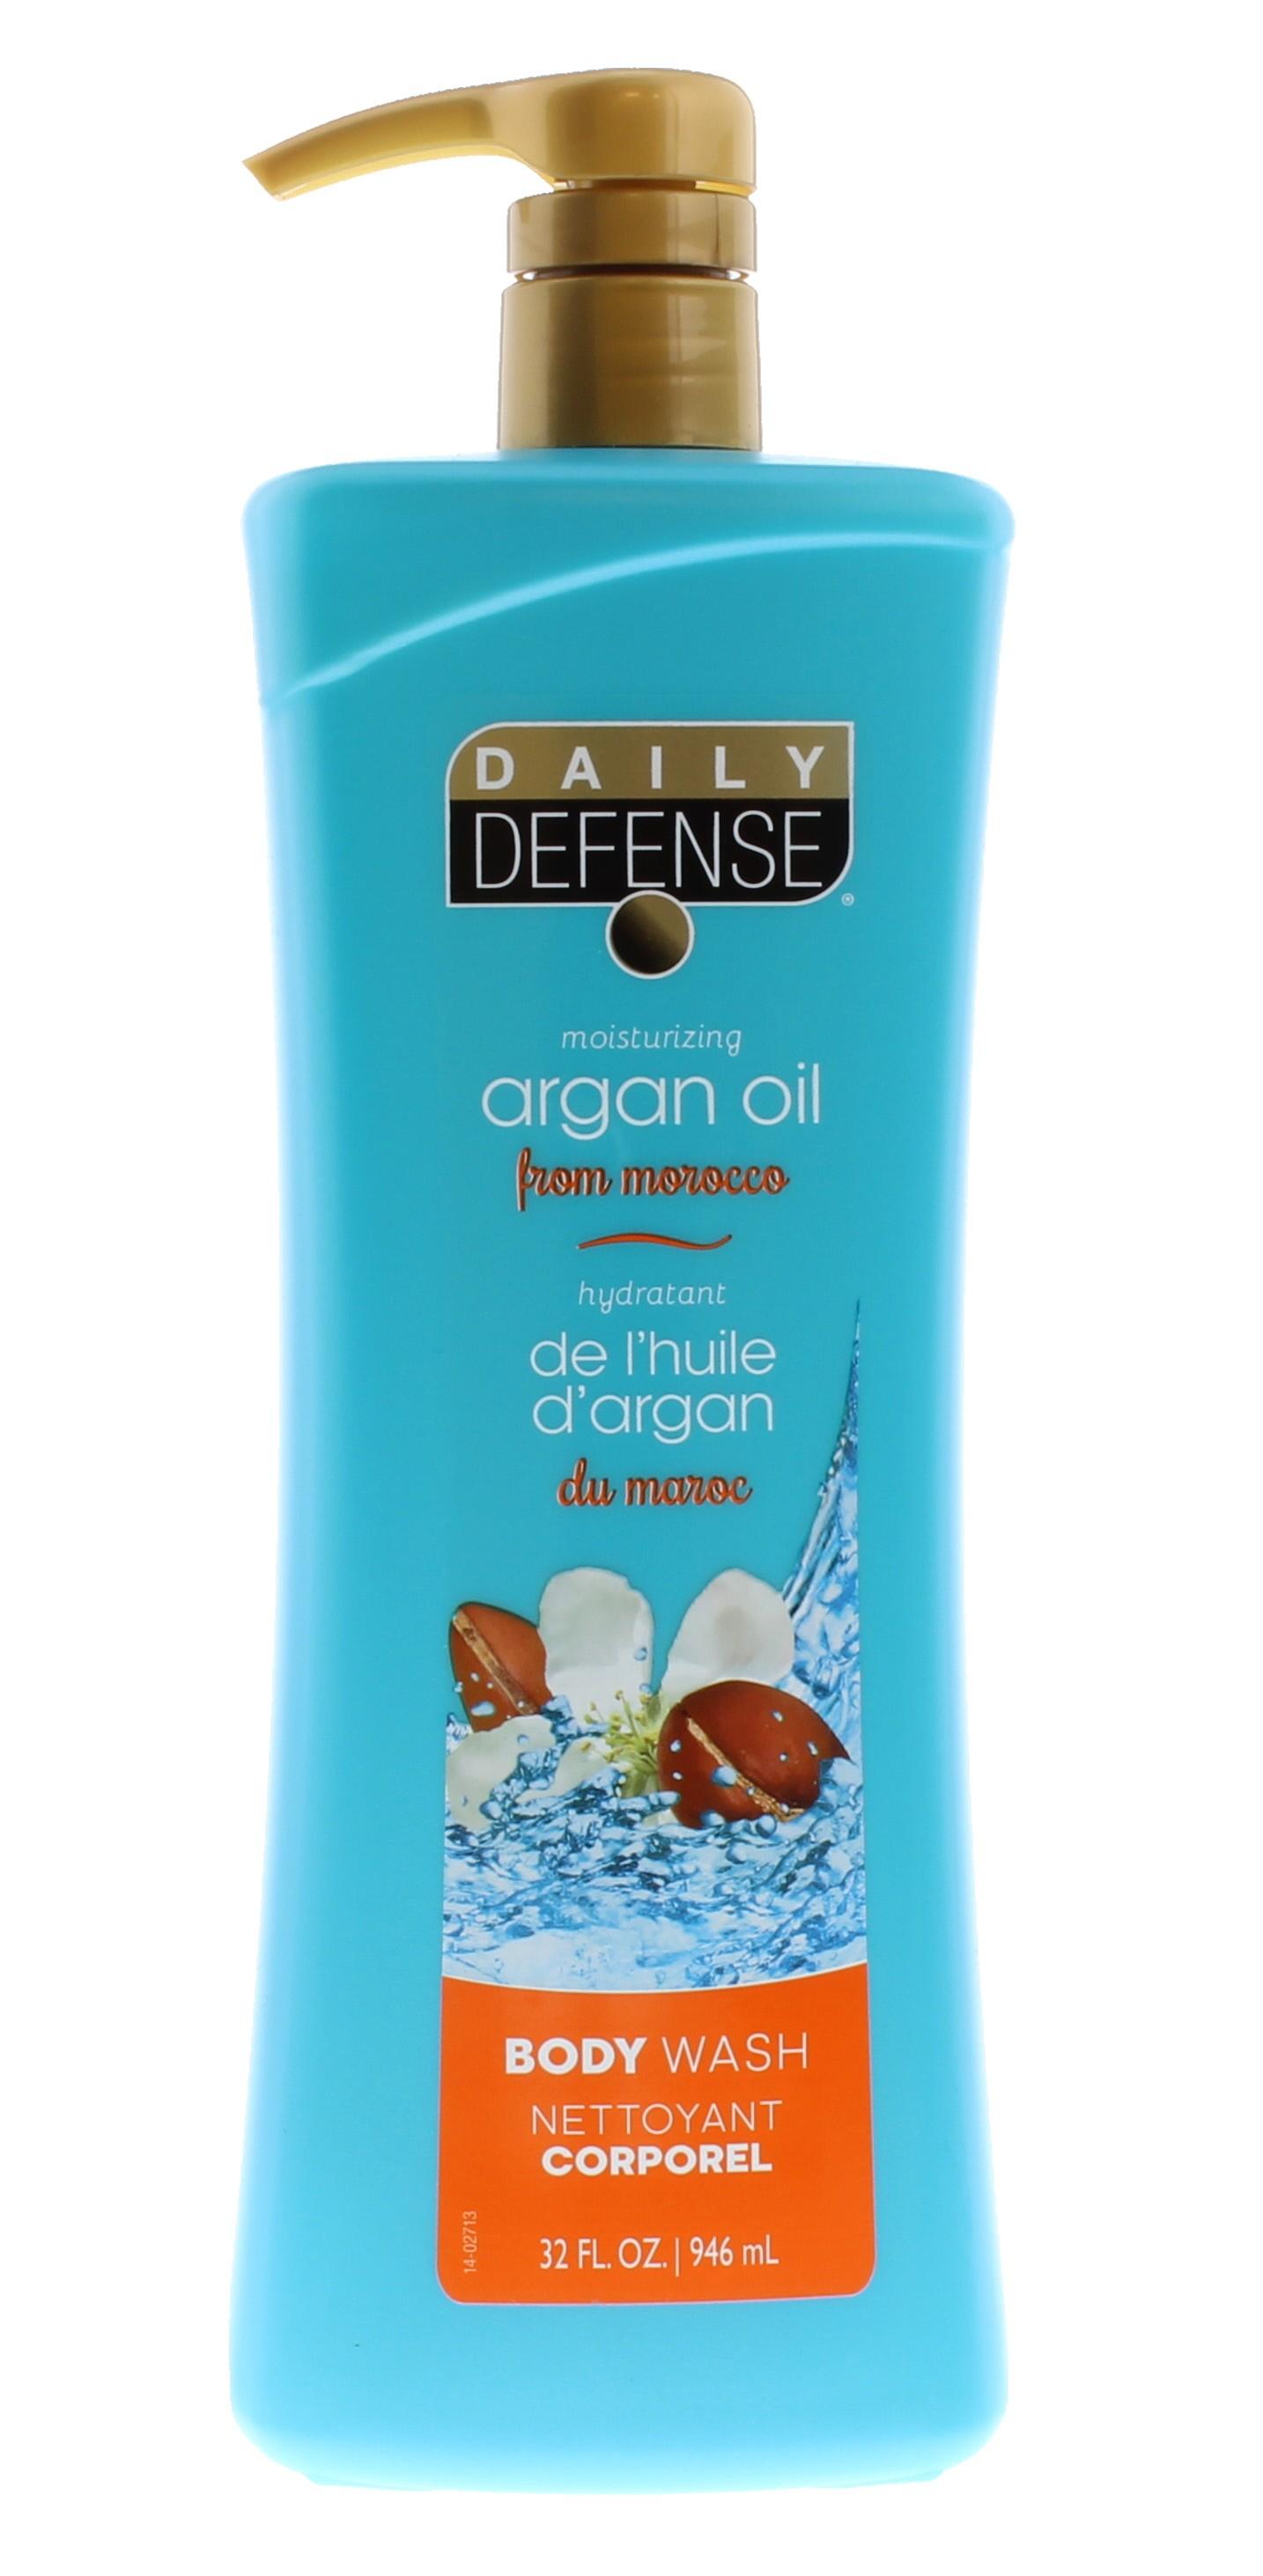 0ab4a90f88 Daily Defense Body Wash Argan Oil - Connective Pharma